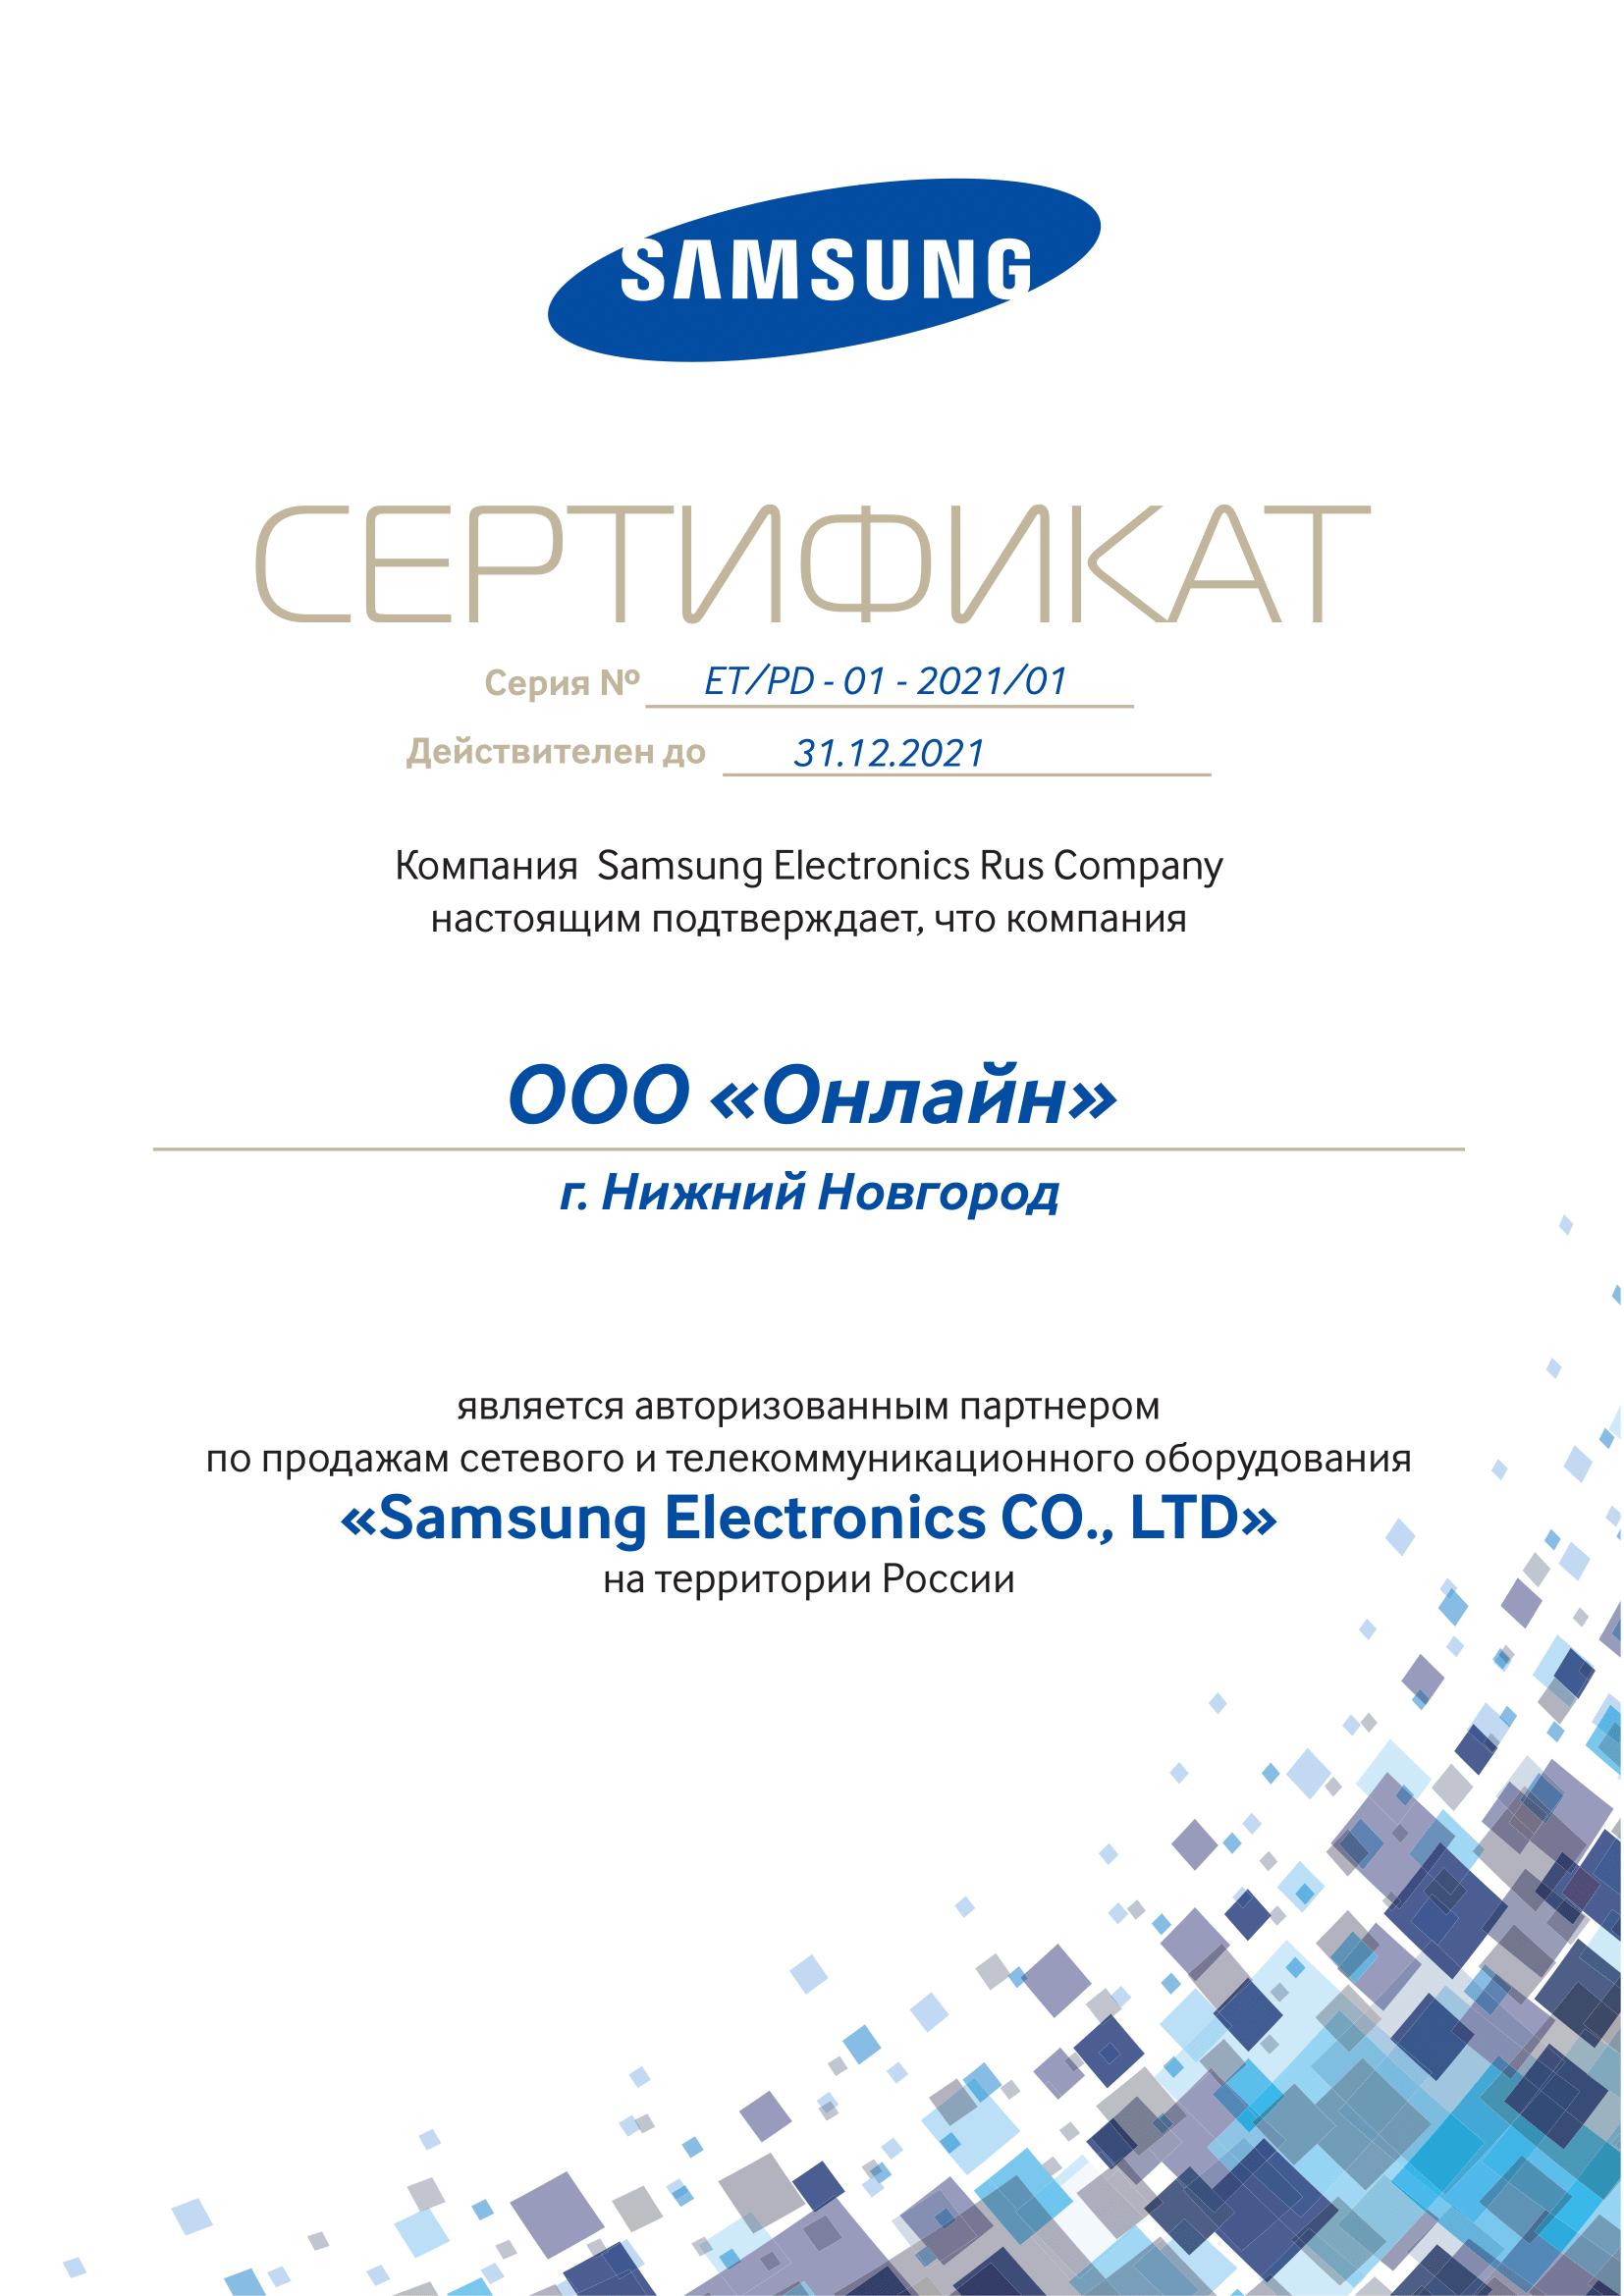 Сертификат Samsung до 31.12.2021